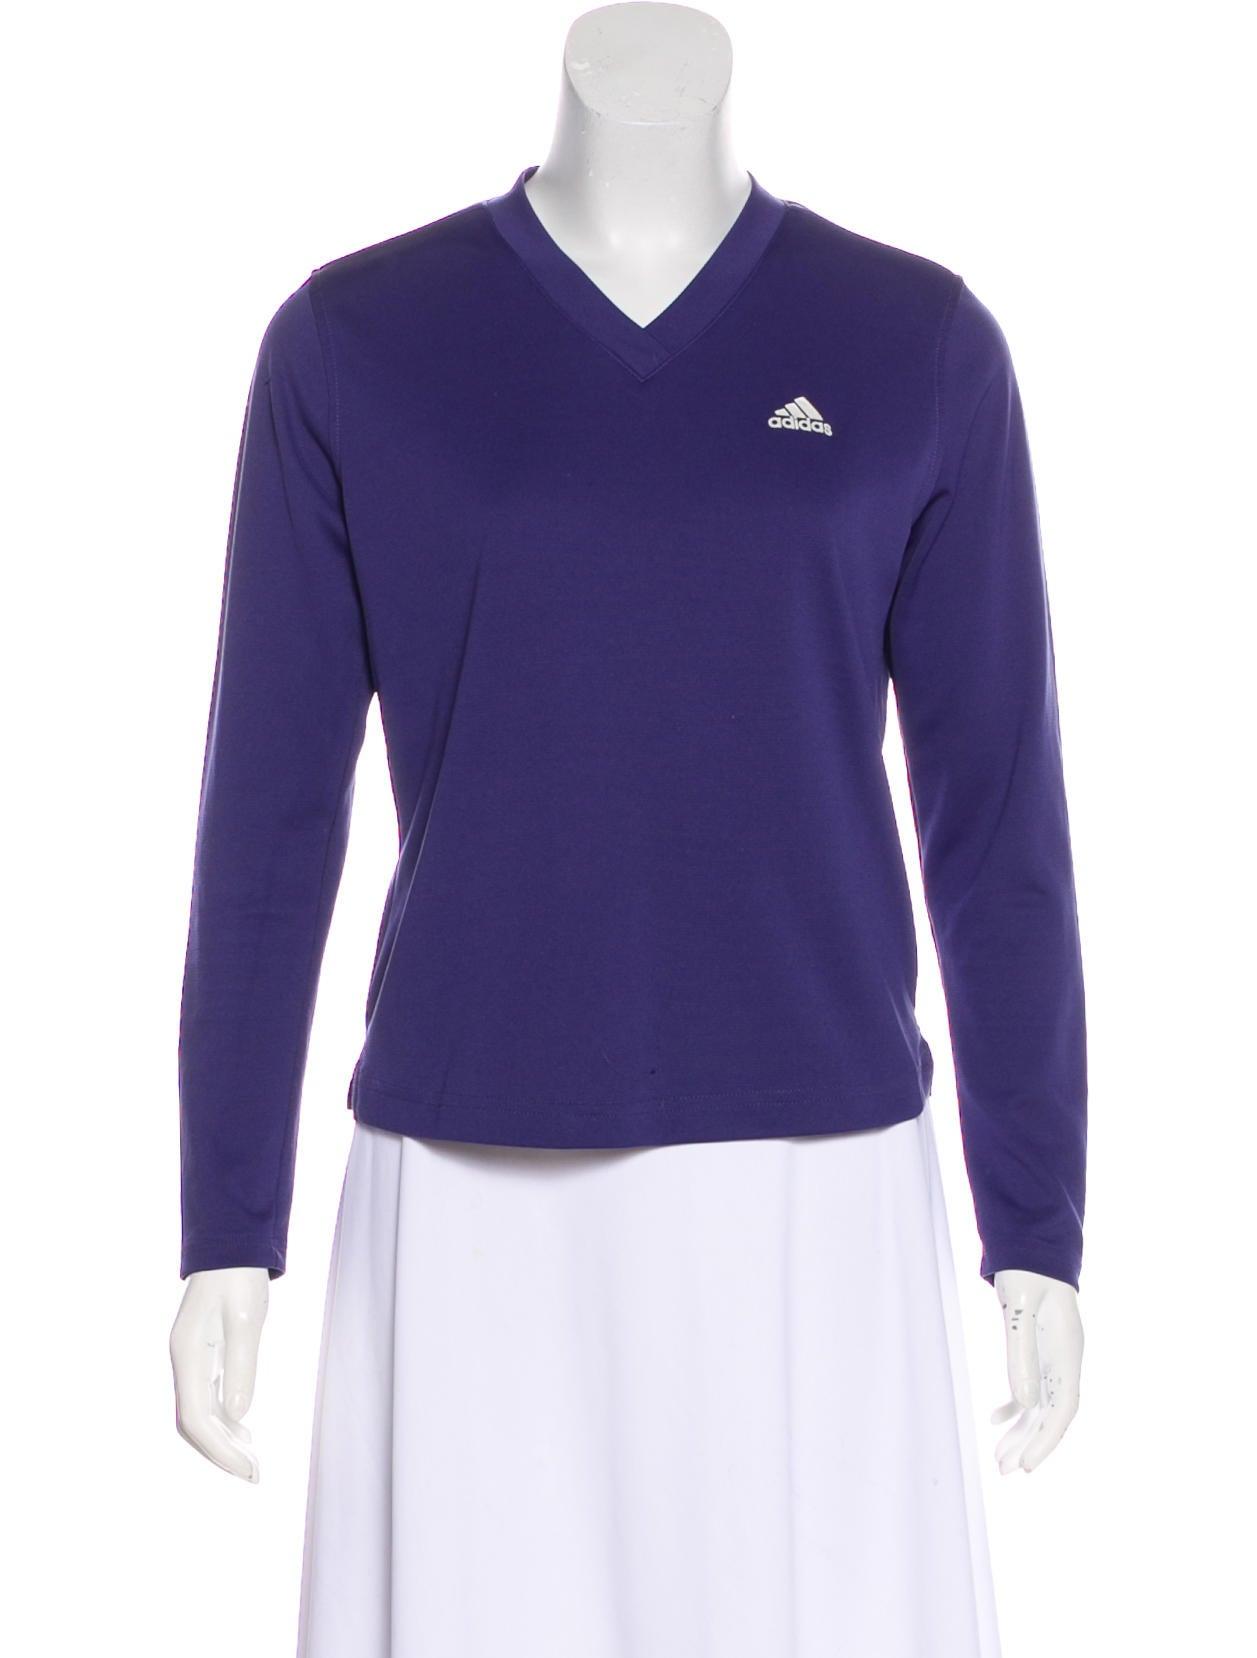 Adidas Athletic V cuello superior ropa 11374 W2ADS22091 superior Athletic | 70c8ee2 - rspr.host